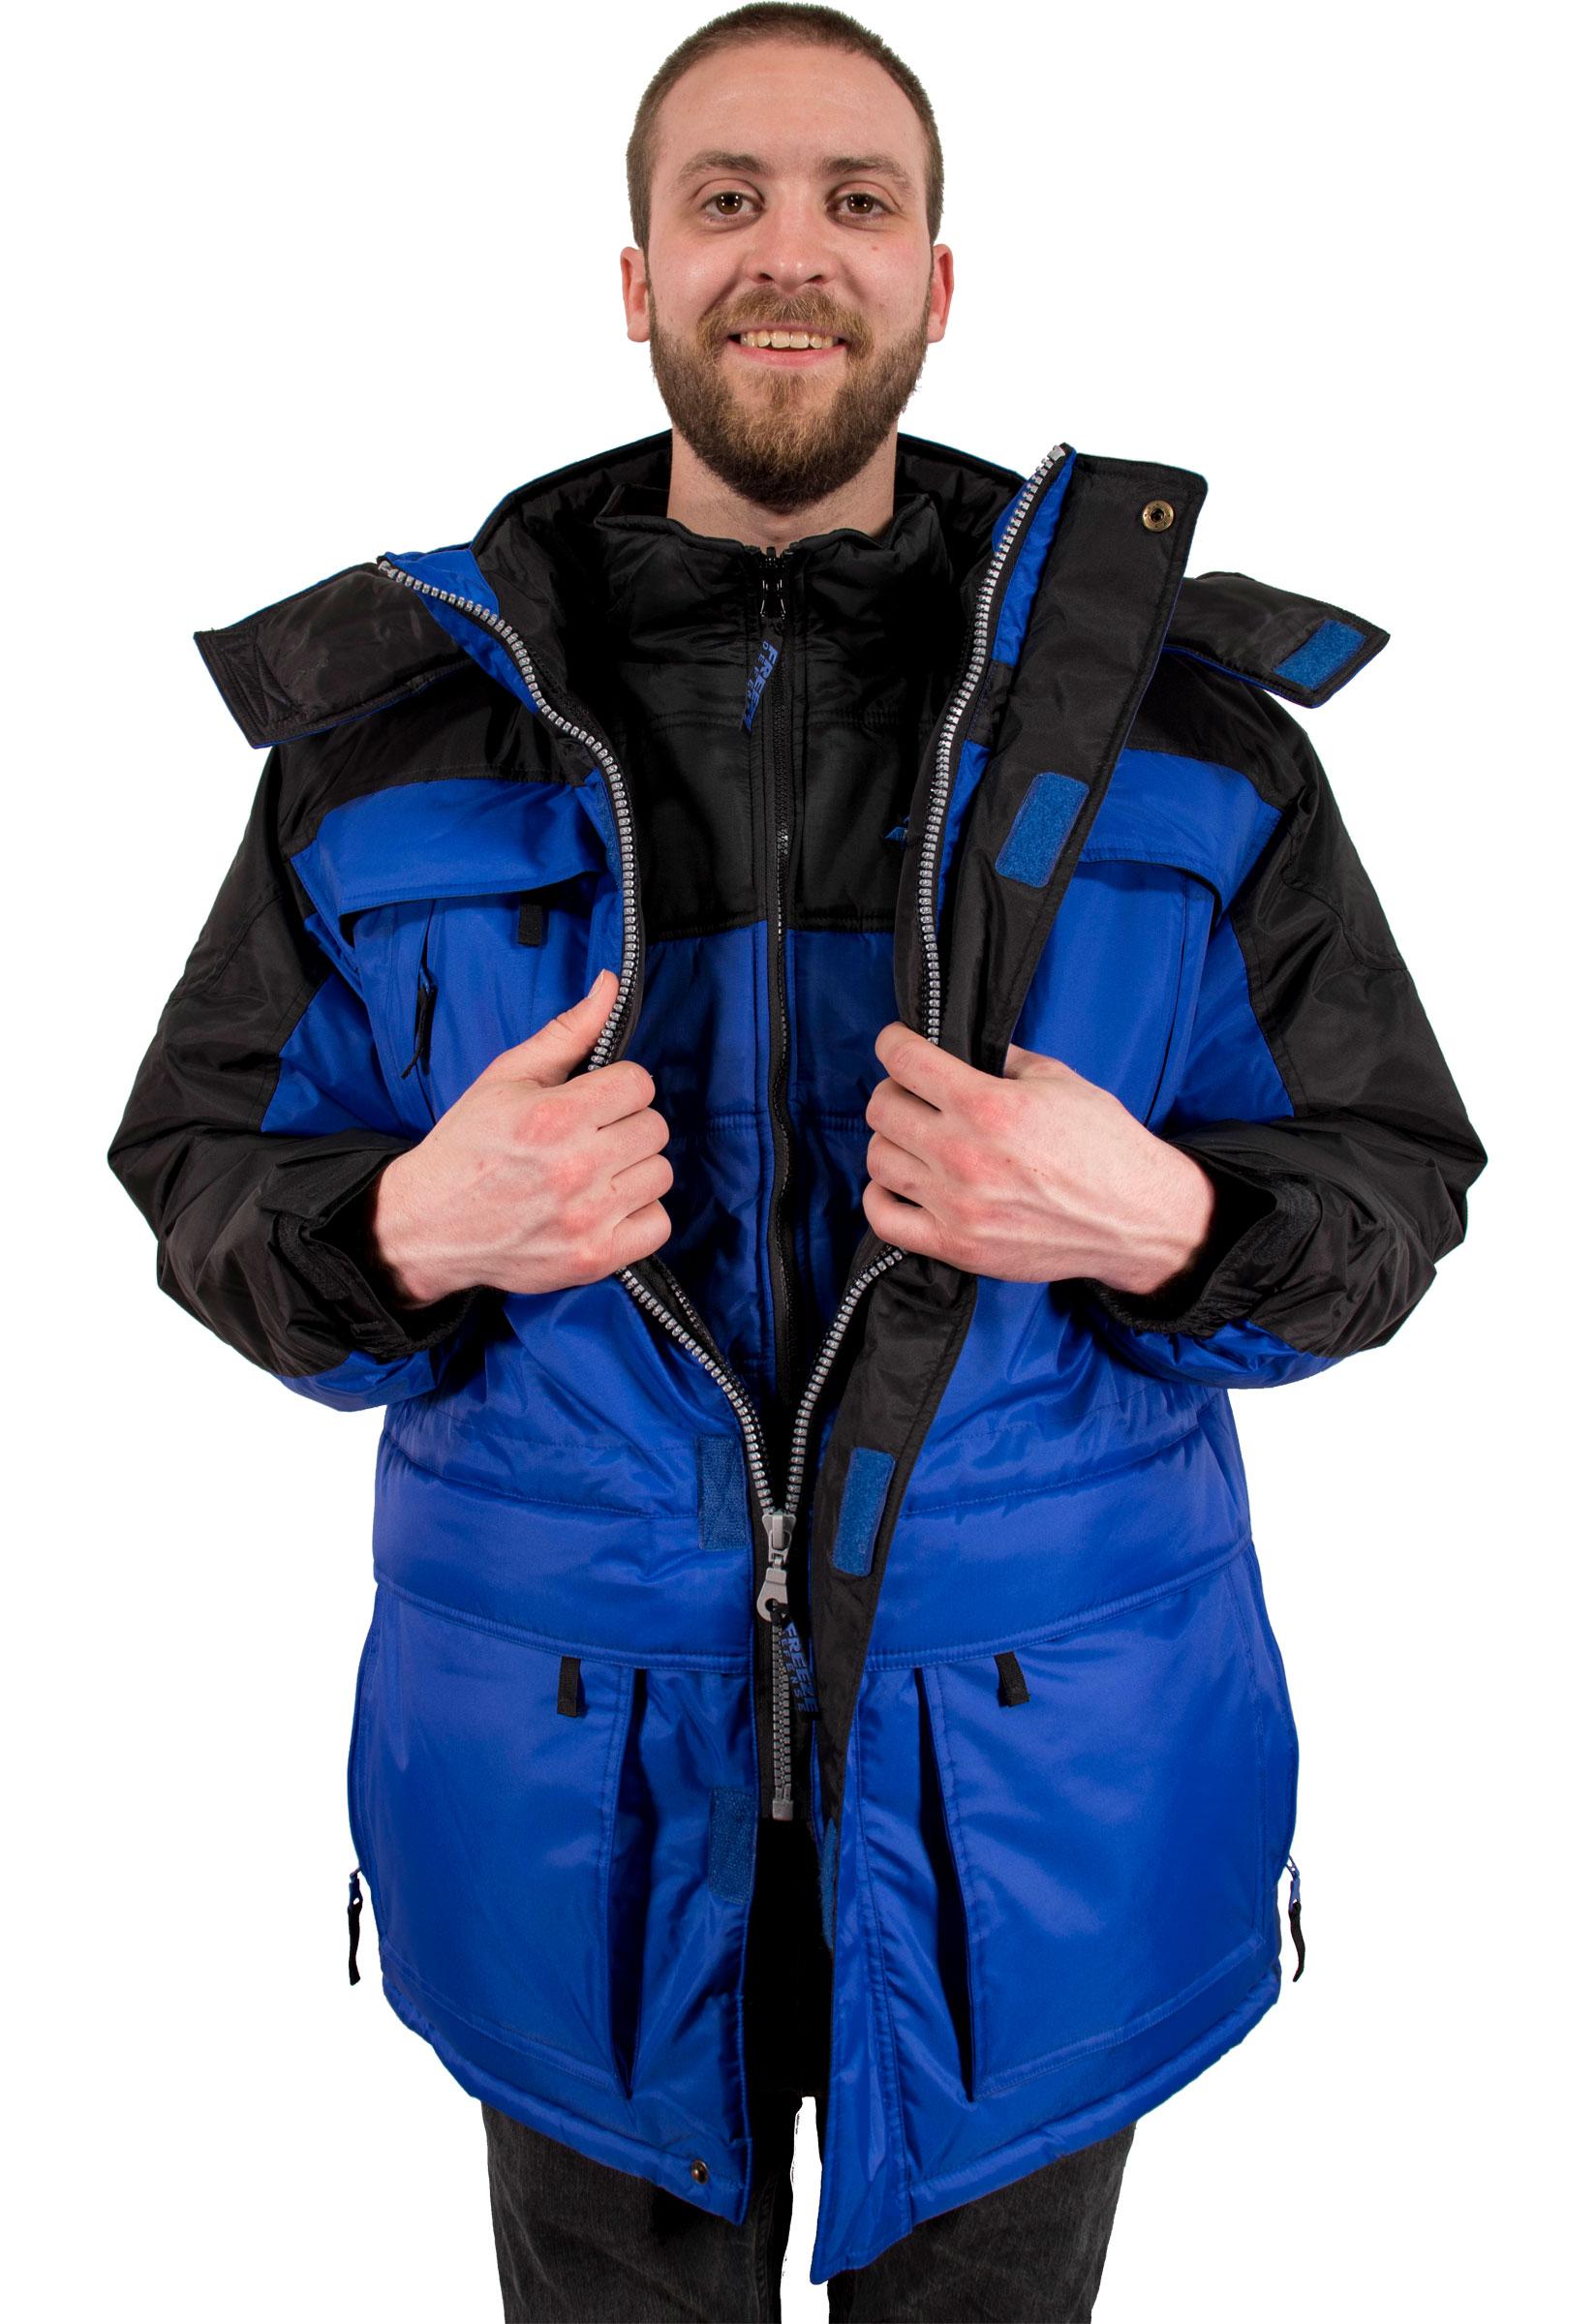 Mind All Winter Buy Your Warm Freeze Defense Winter Coat Vest Warmest Winter Coats 2016 Warmest Winter Coats Mens Uk A Vest You Can Wear Our Warmest Coat That Comes bark post Warmest Winter Coats